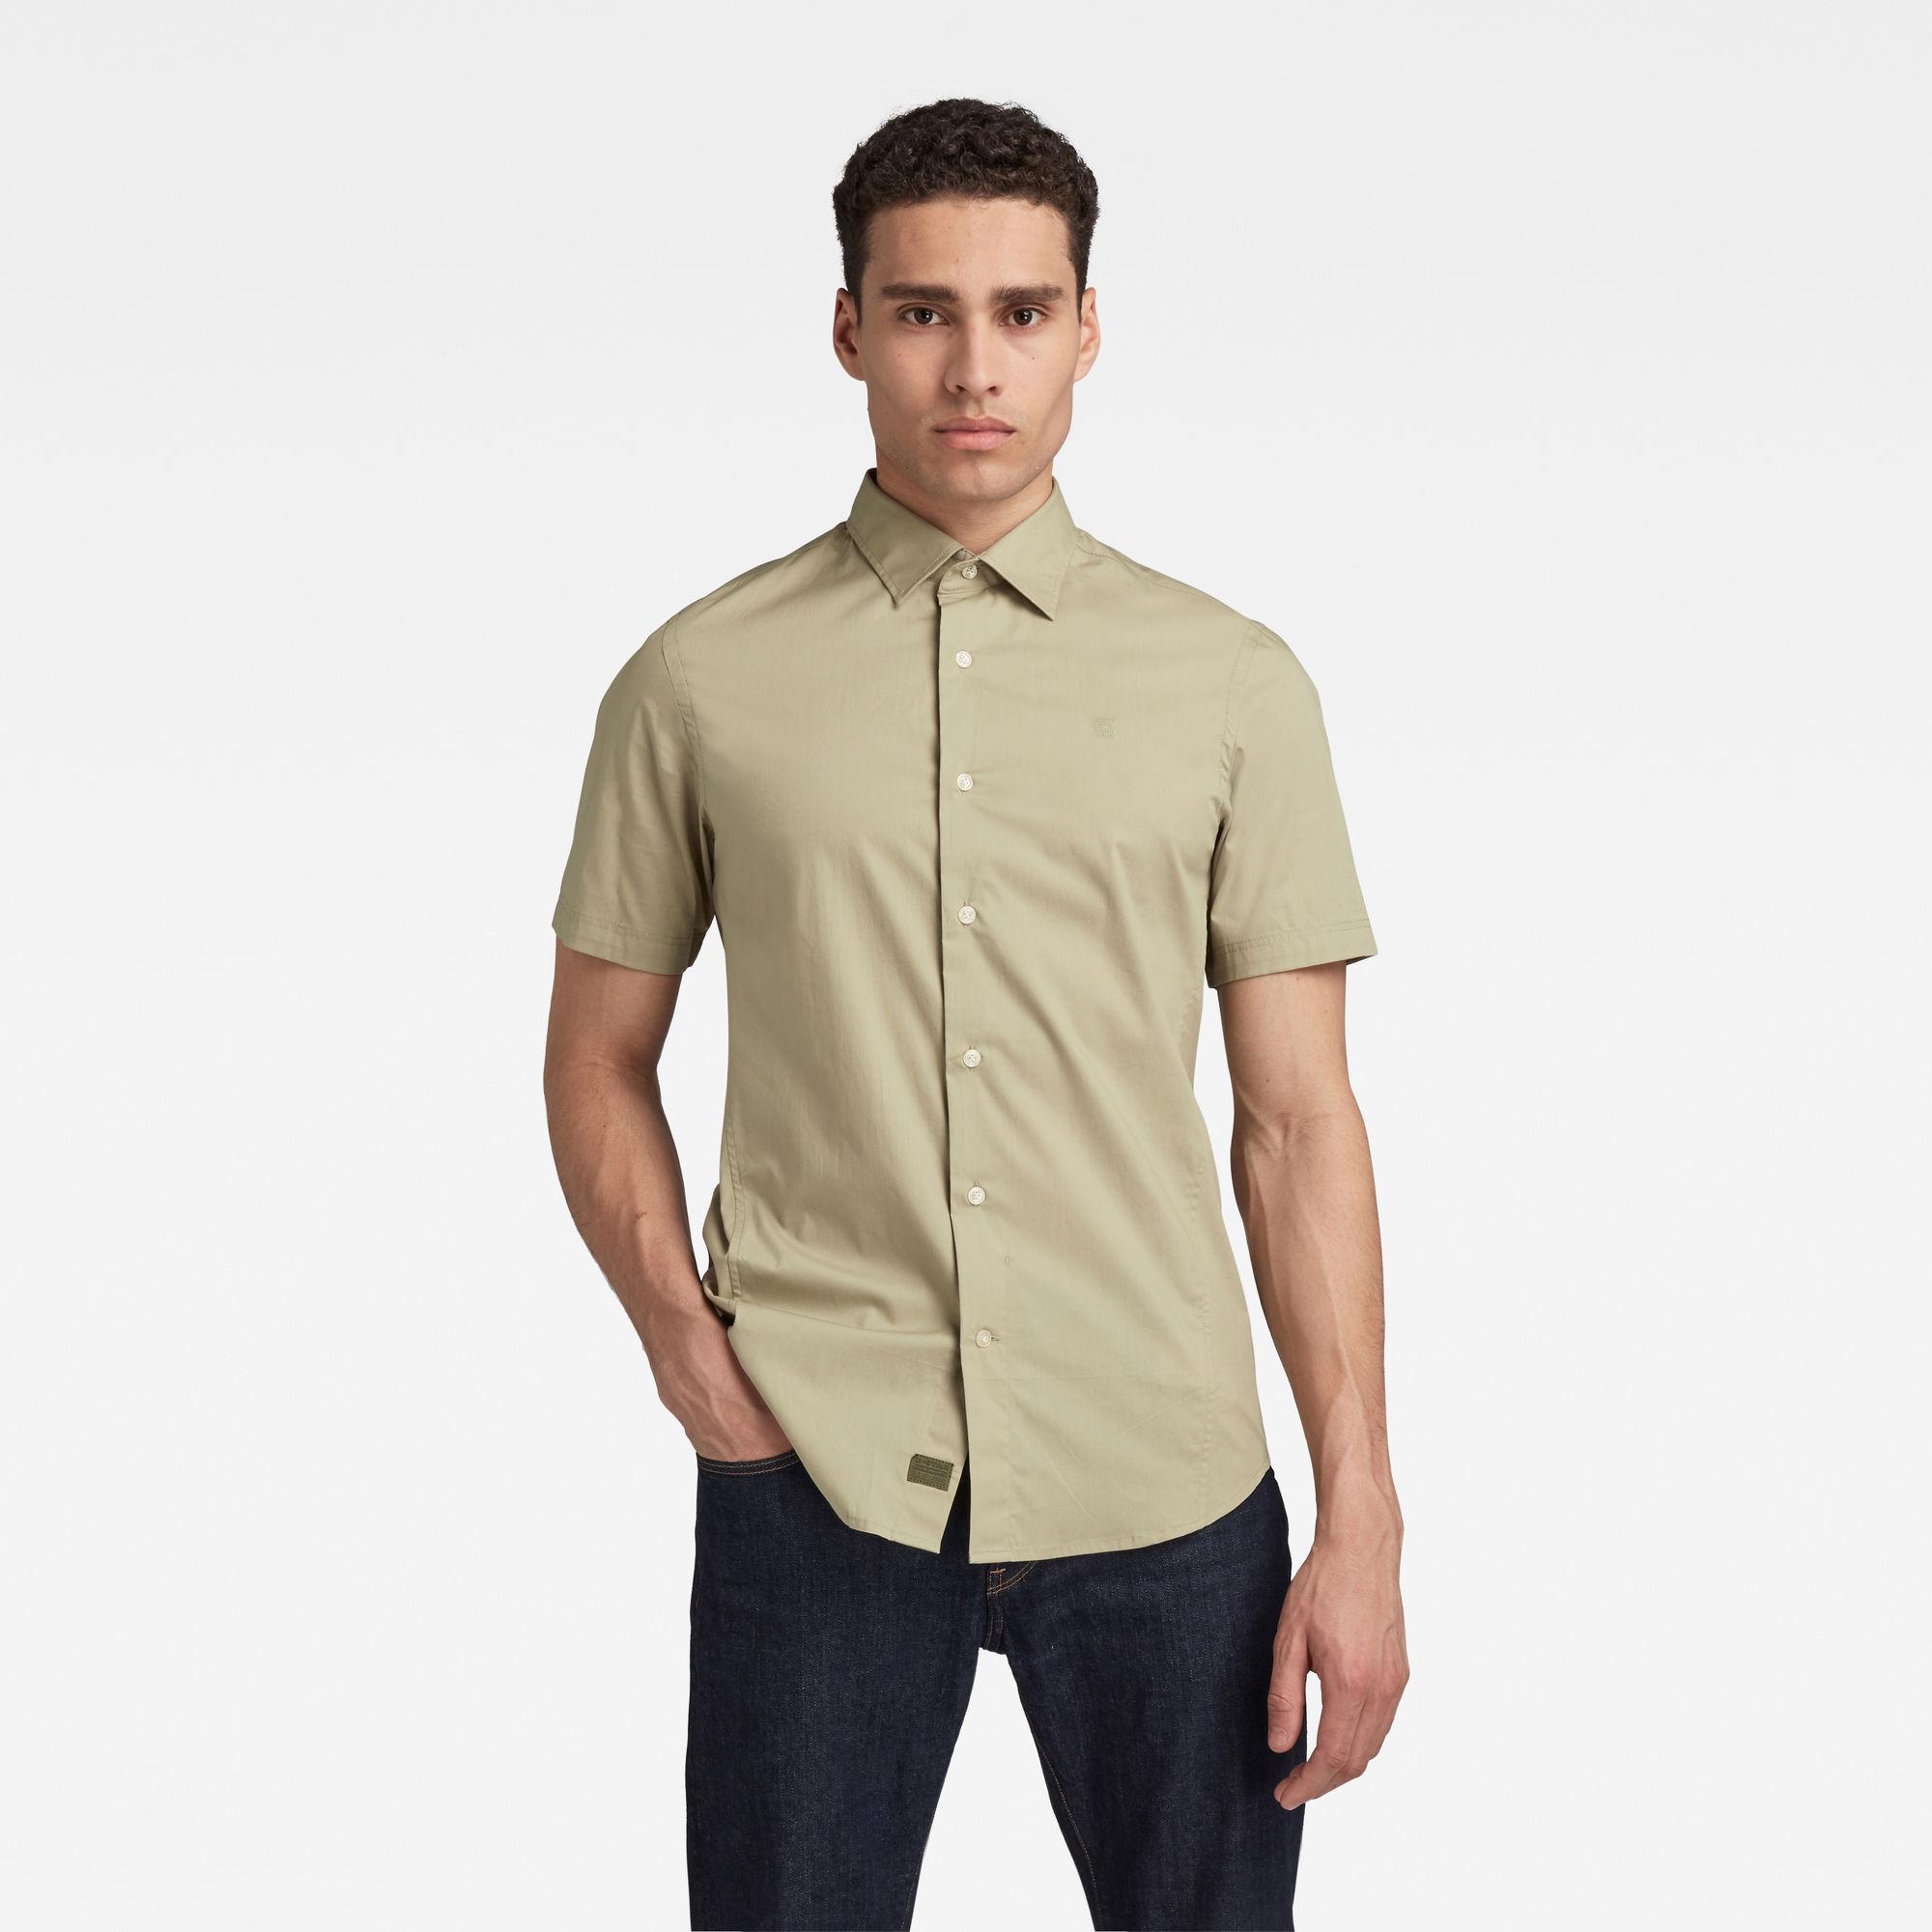 G-Star RAW Heren Dressed Super Slim Shirt Groen